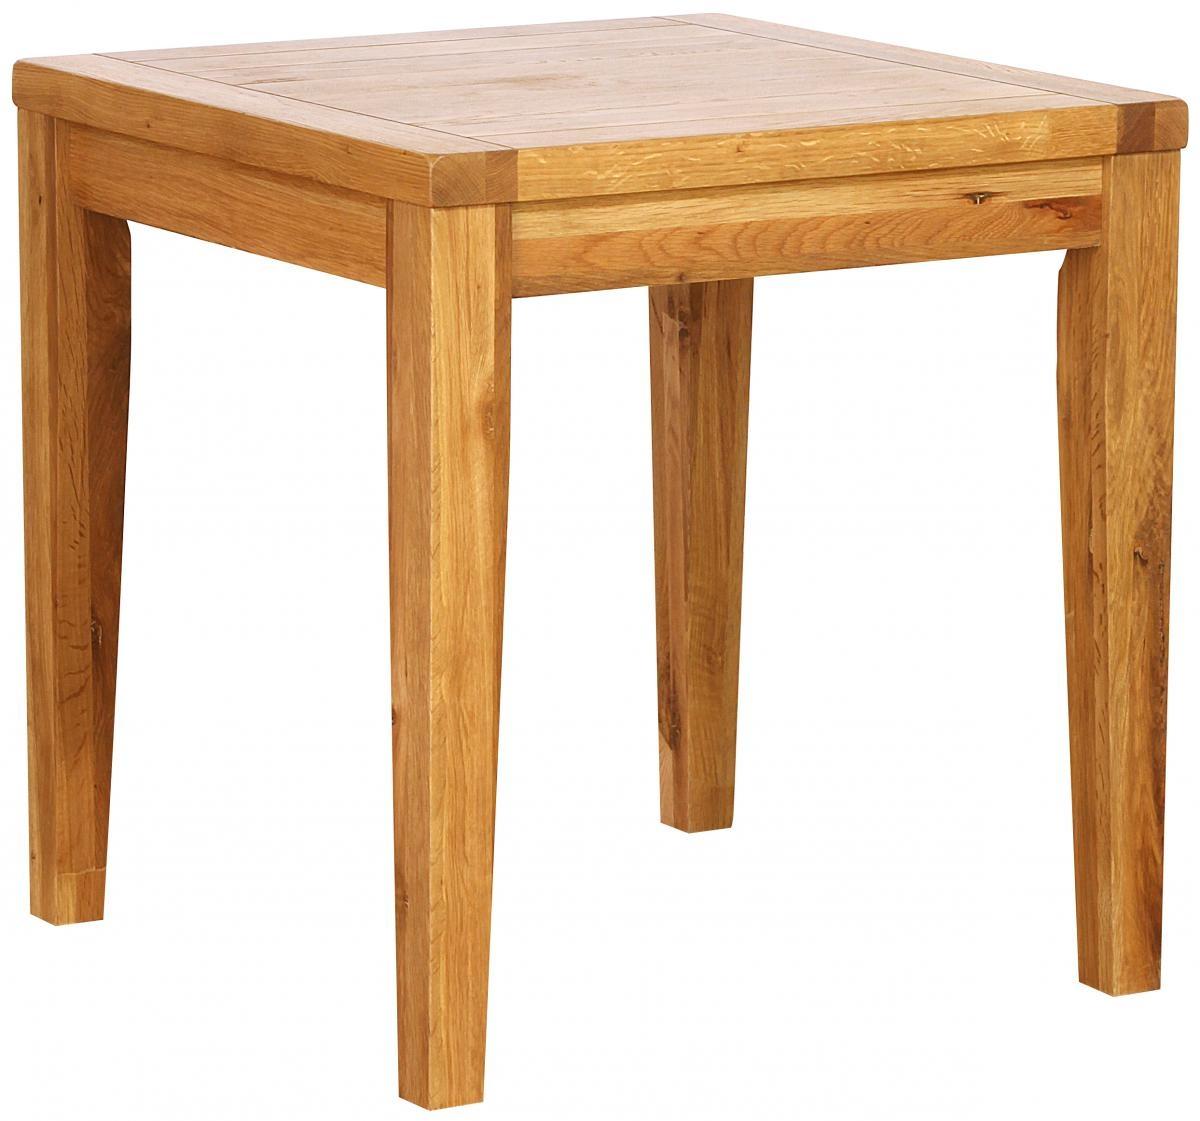 Vancouver Petite Oak Square Dining Table 75cm